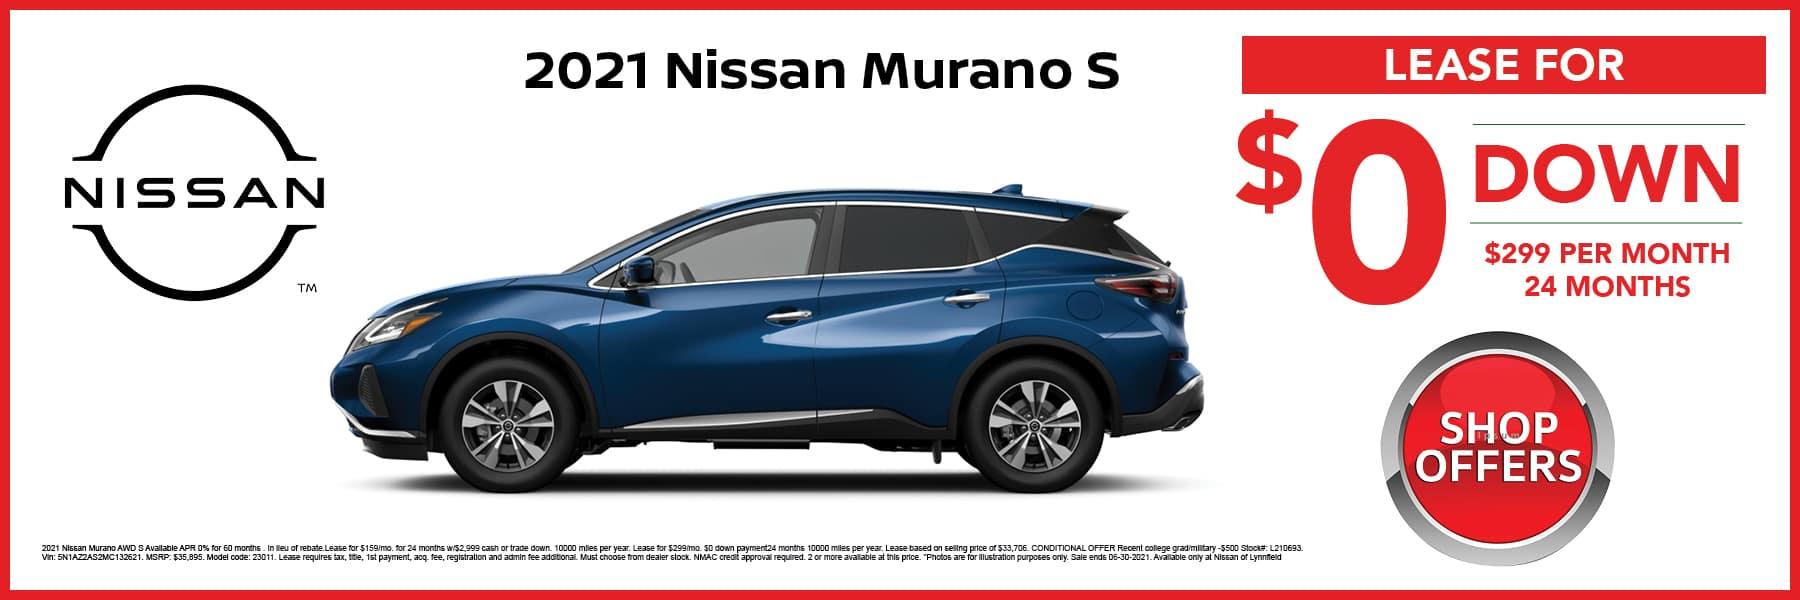 2021 Nissan Murano S in Blue Lease Offer Web Slide